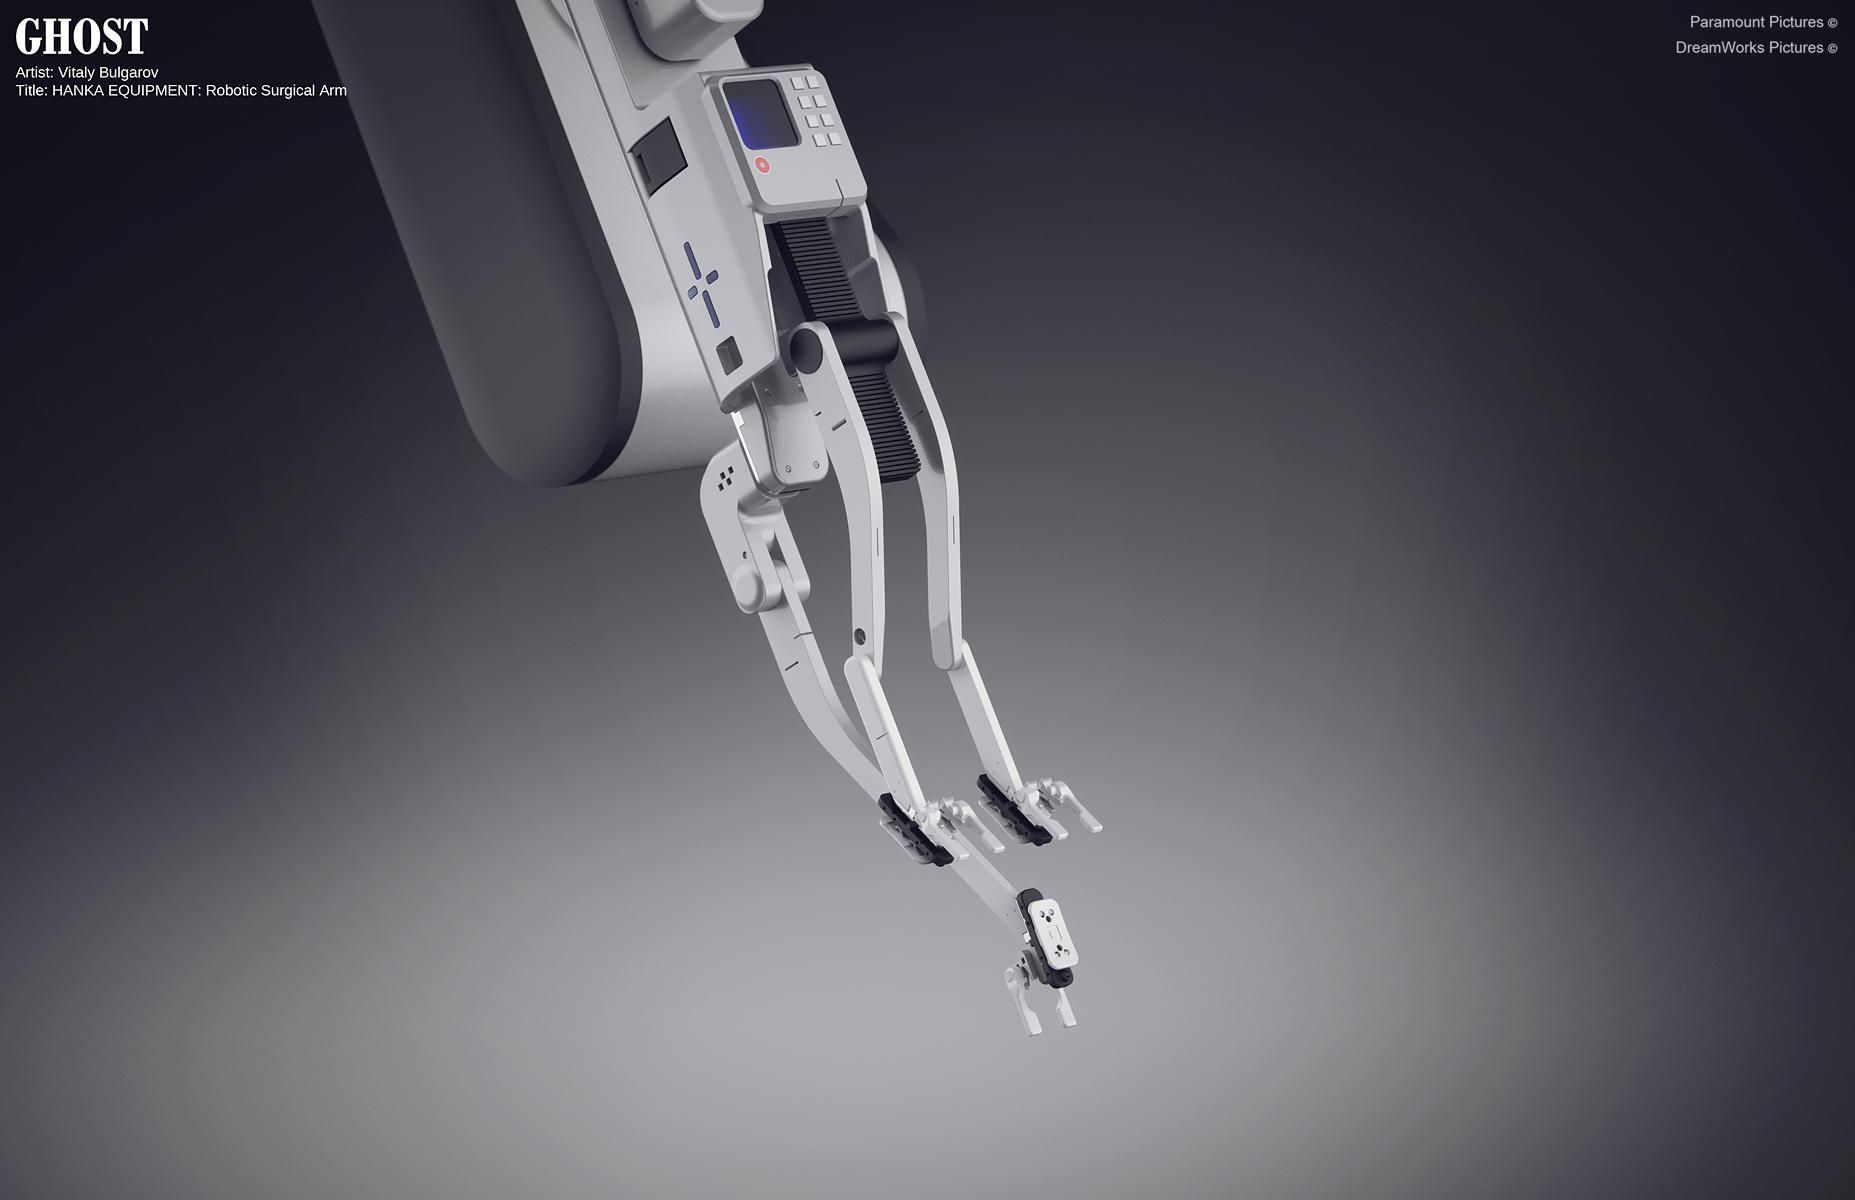 GITS_HANKA_SurgicalGear_Arm_07.jpg